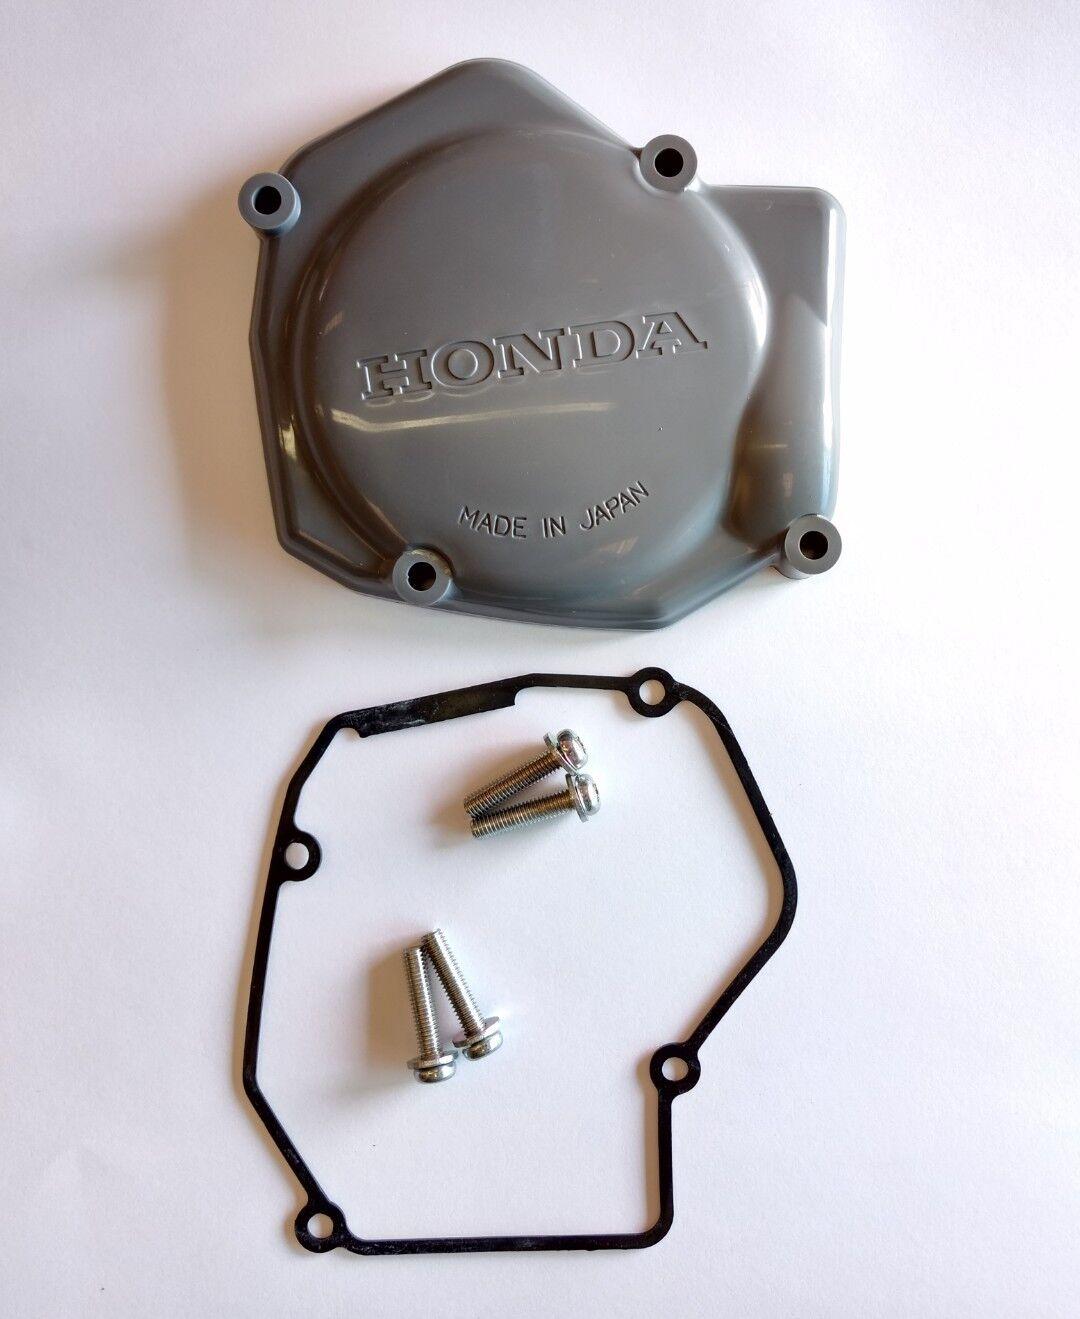 Honda CT 110 Left Crankcase Alternator Charging Stator Flywheel Cover Gasket